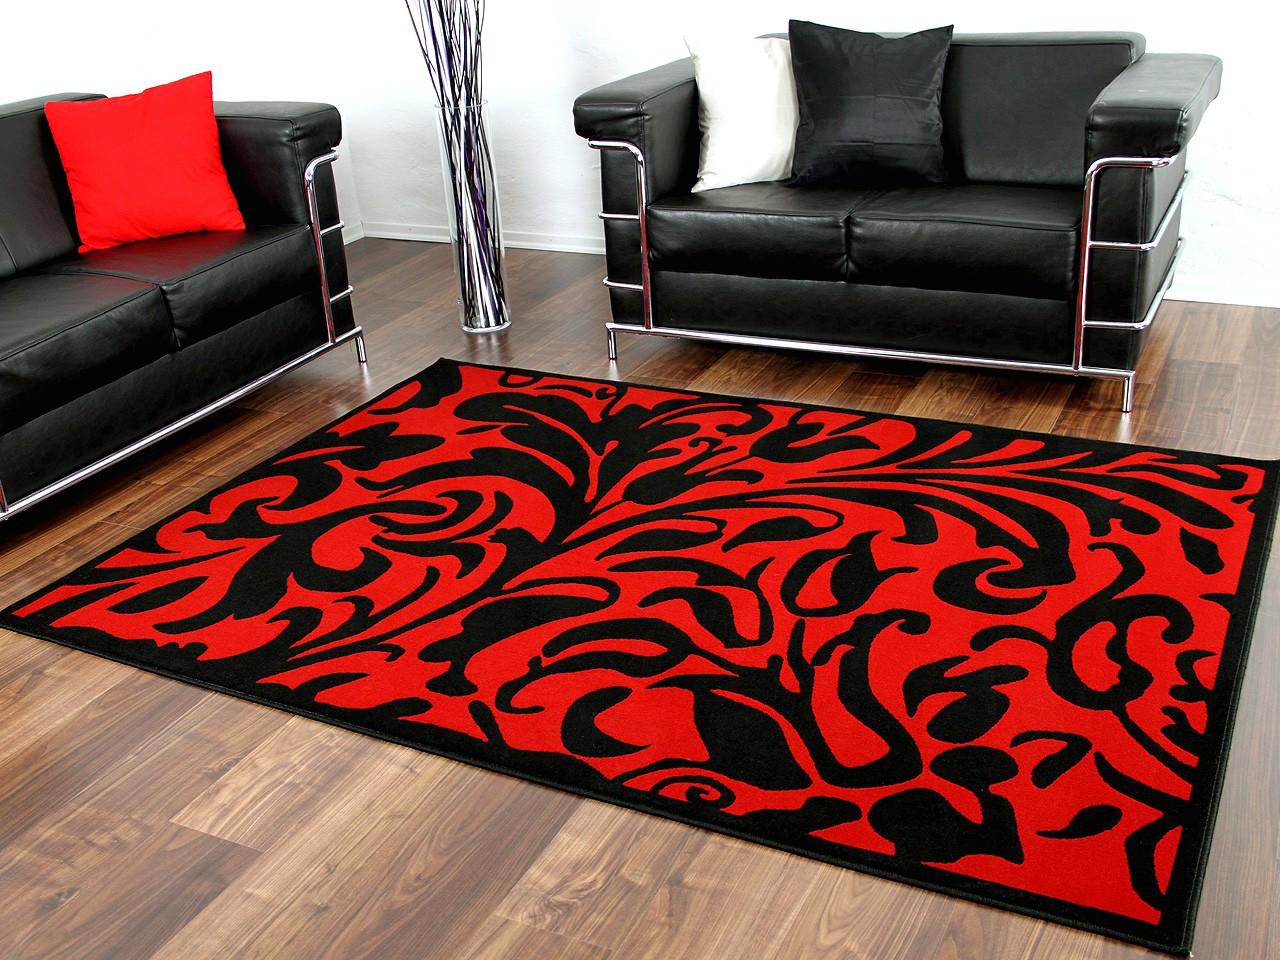 designer teppich passion schwarz rot barock teppiche designerteppiche passion teppiche. Black Bedroom Furniture Sets. Home Design Ideas